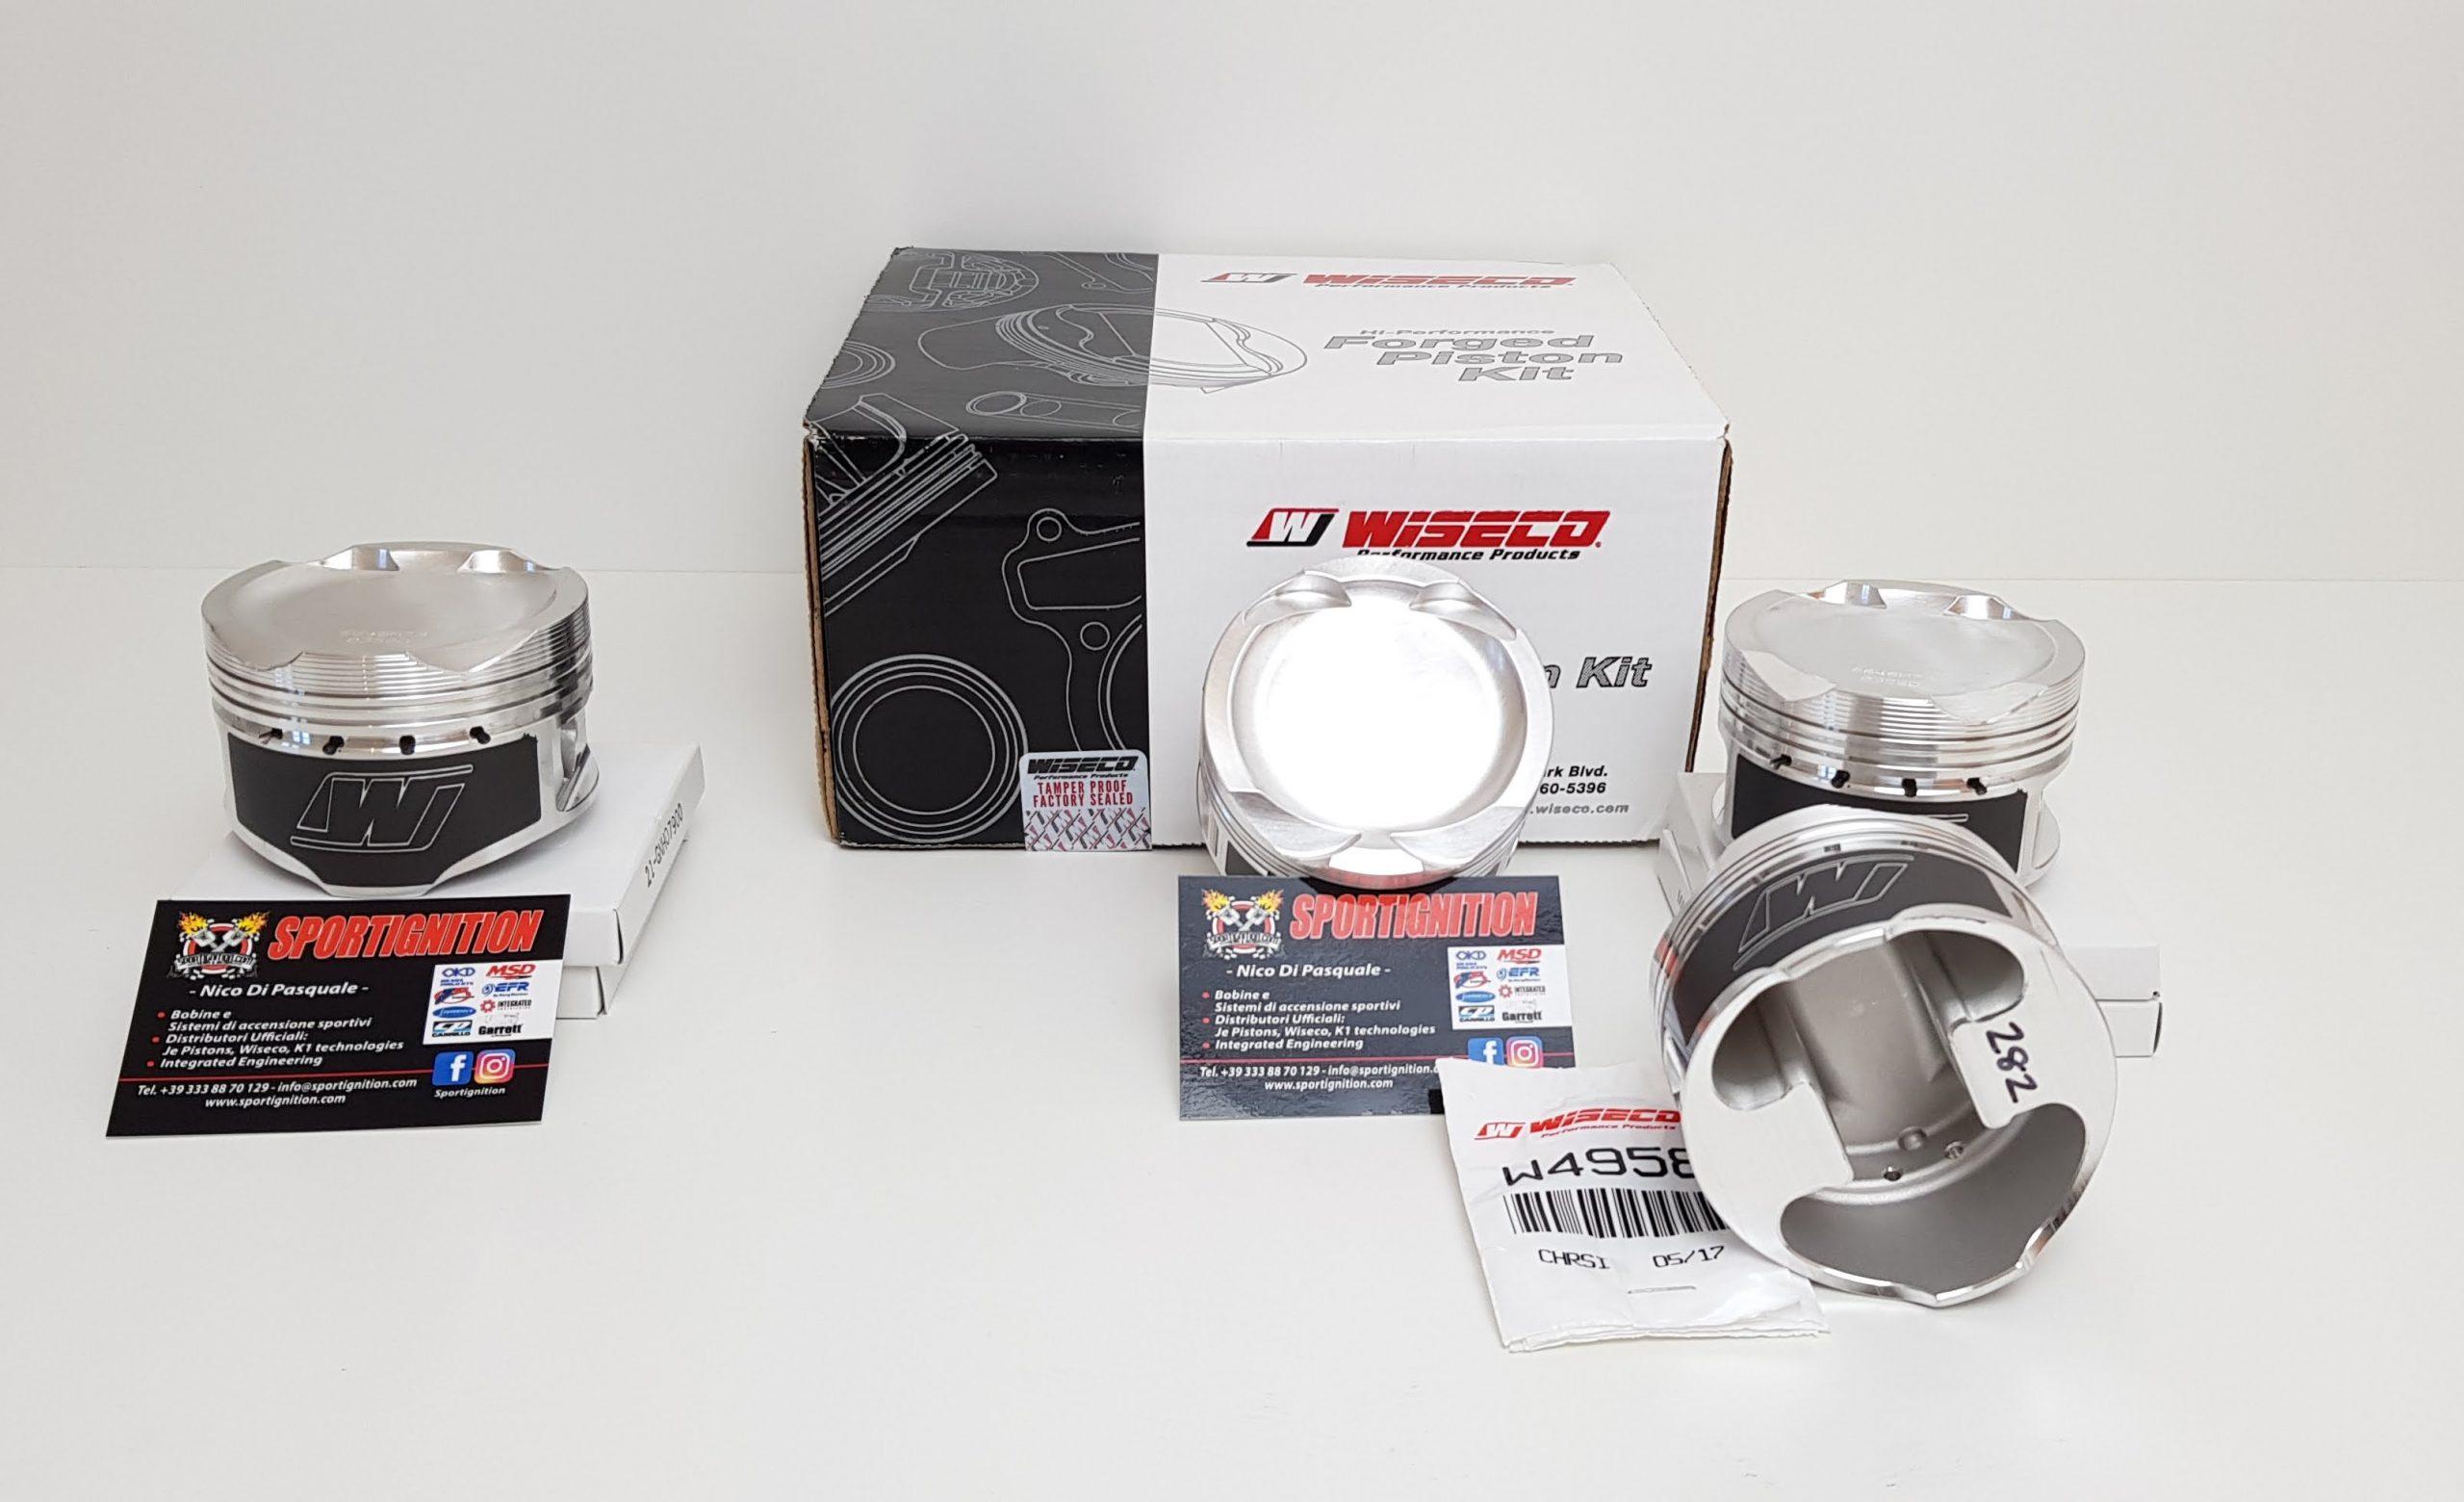 turbo conversion Wiseco Psa ke128m785 Tu5jp4 Sportignition